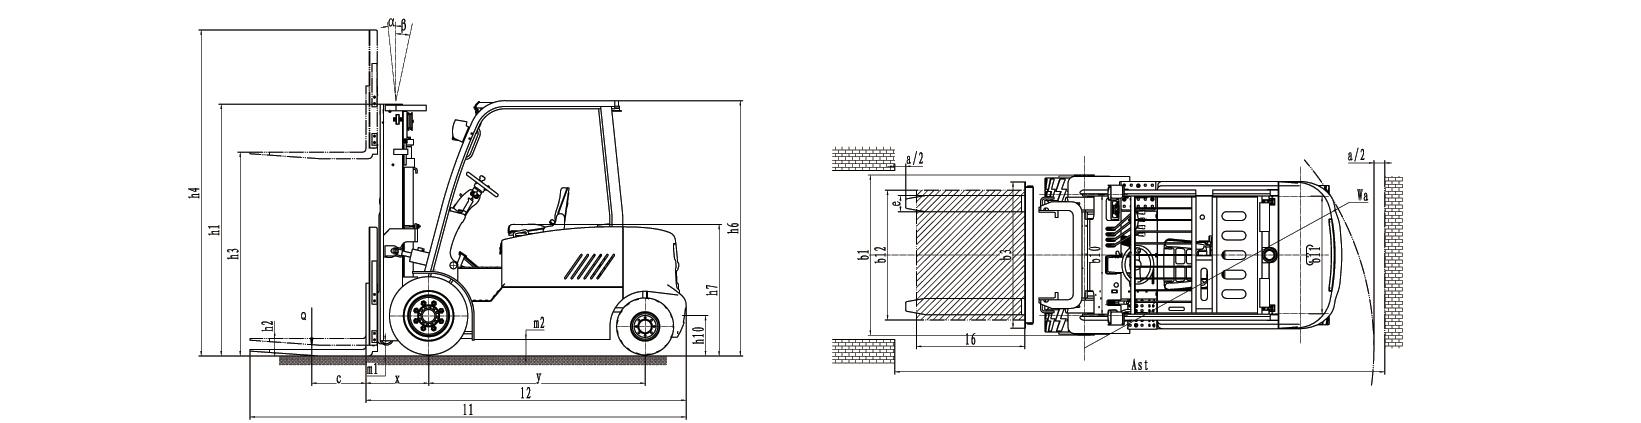 draw.jpg (167 KB)